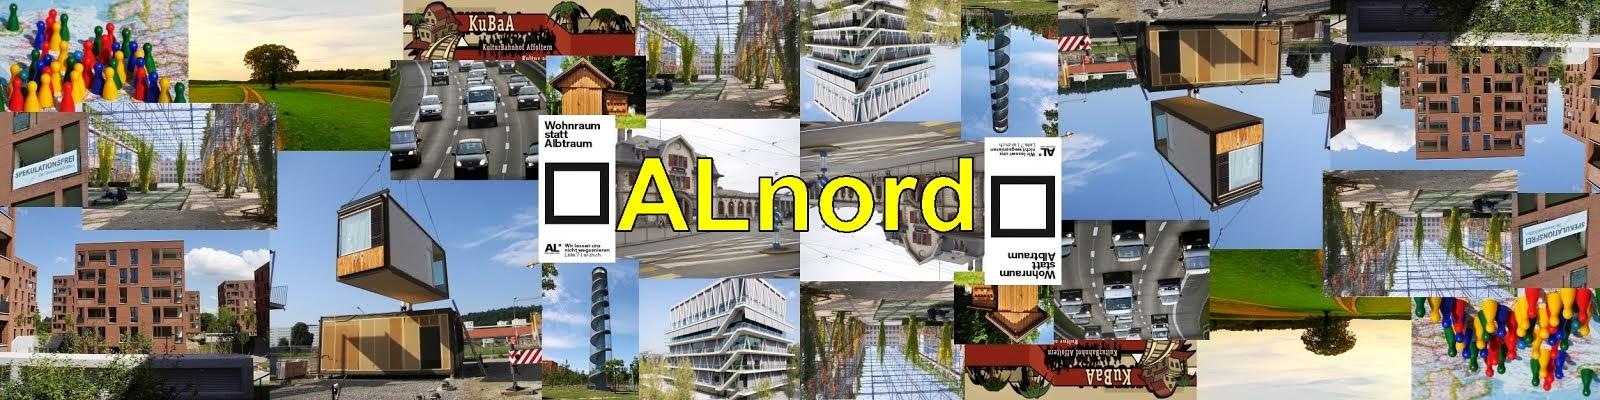 ALzürinord